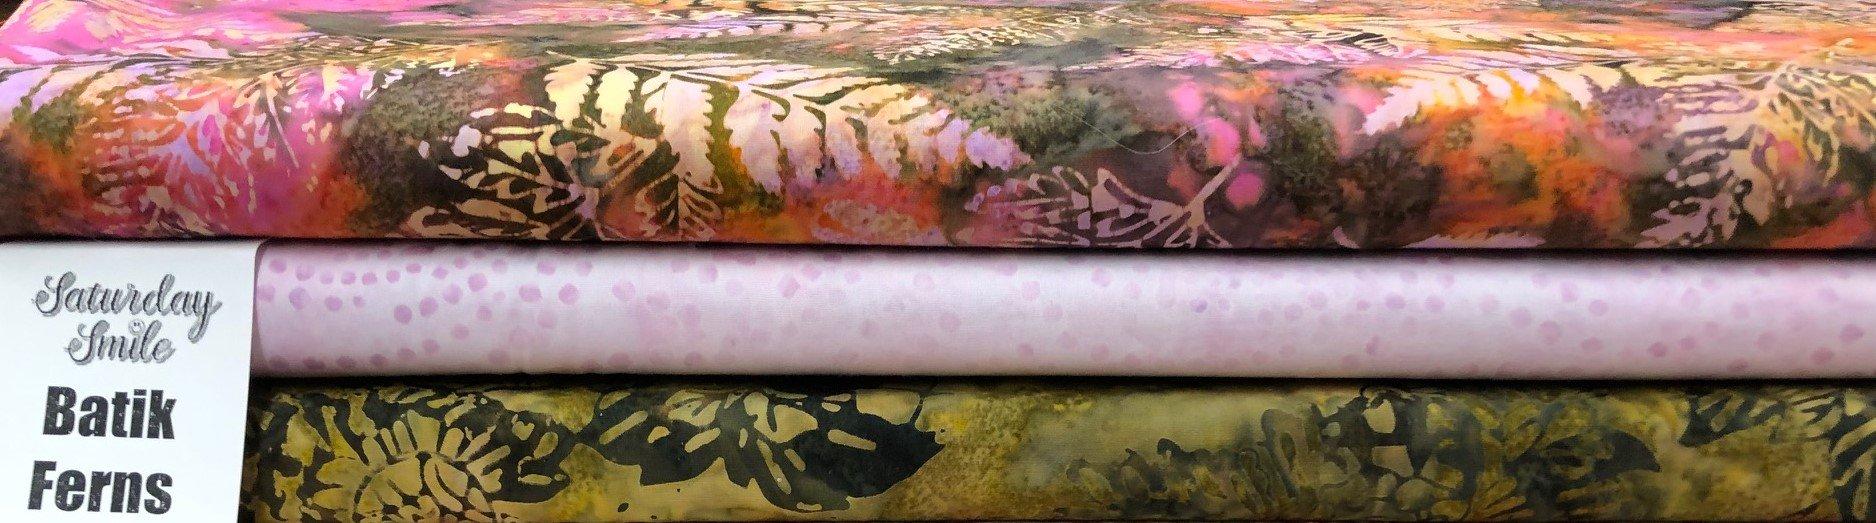 Batik Ferns